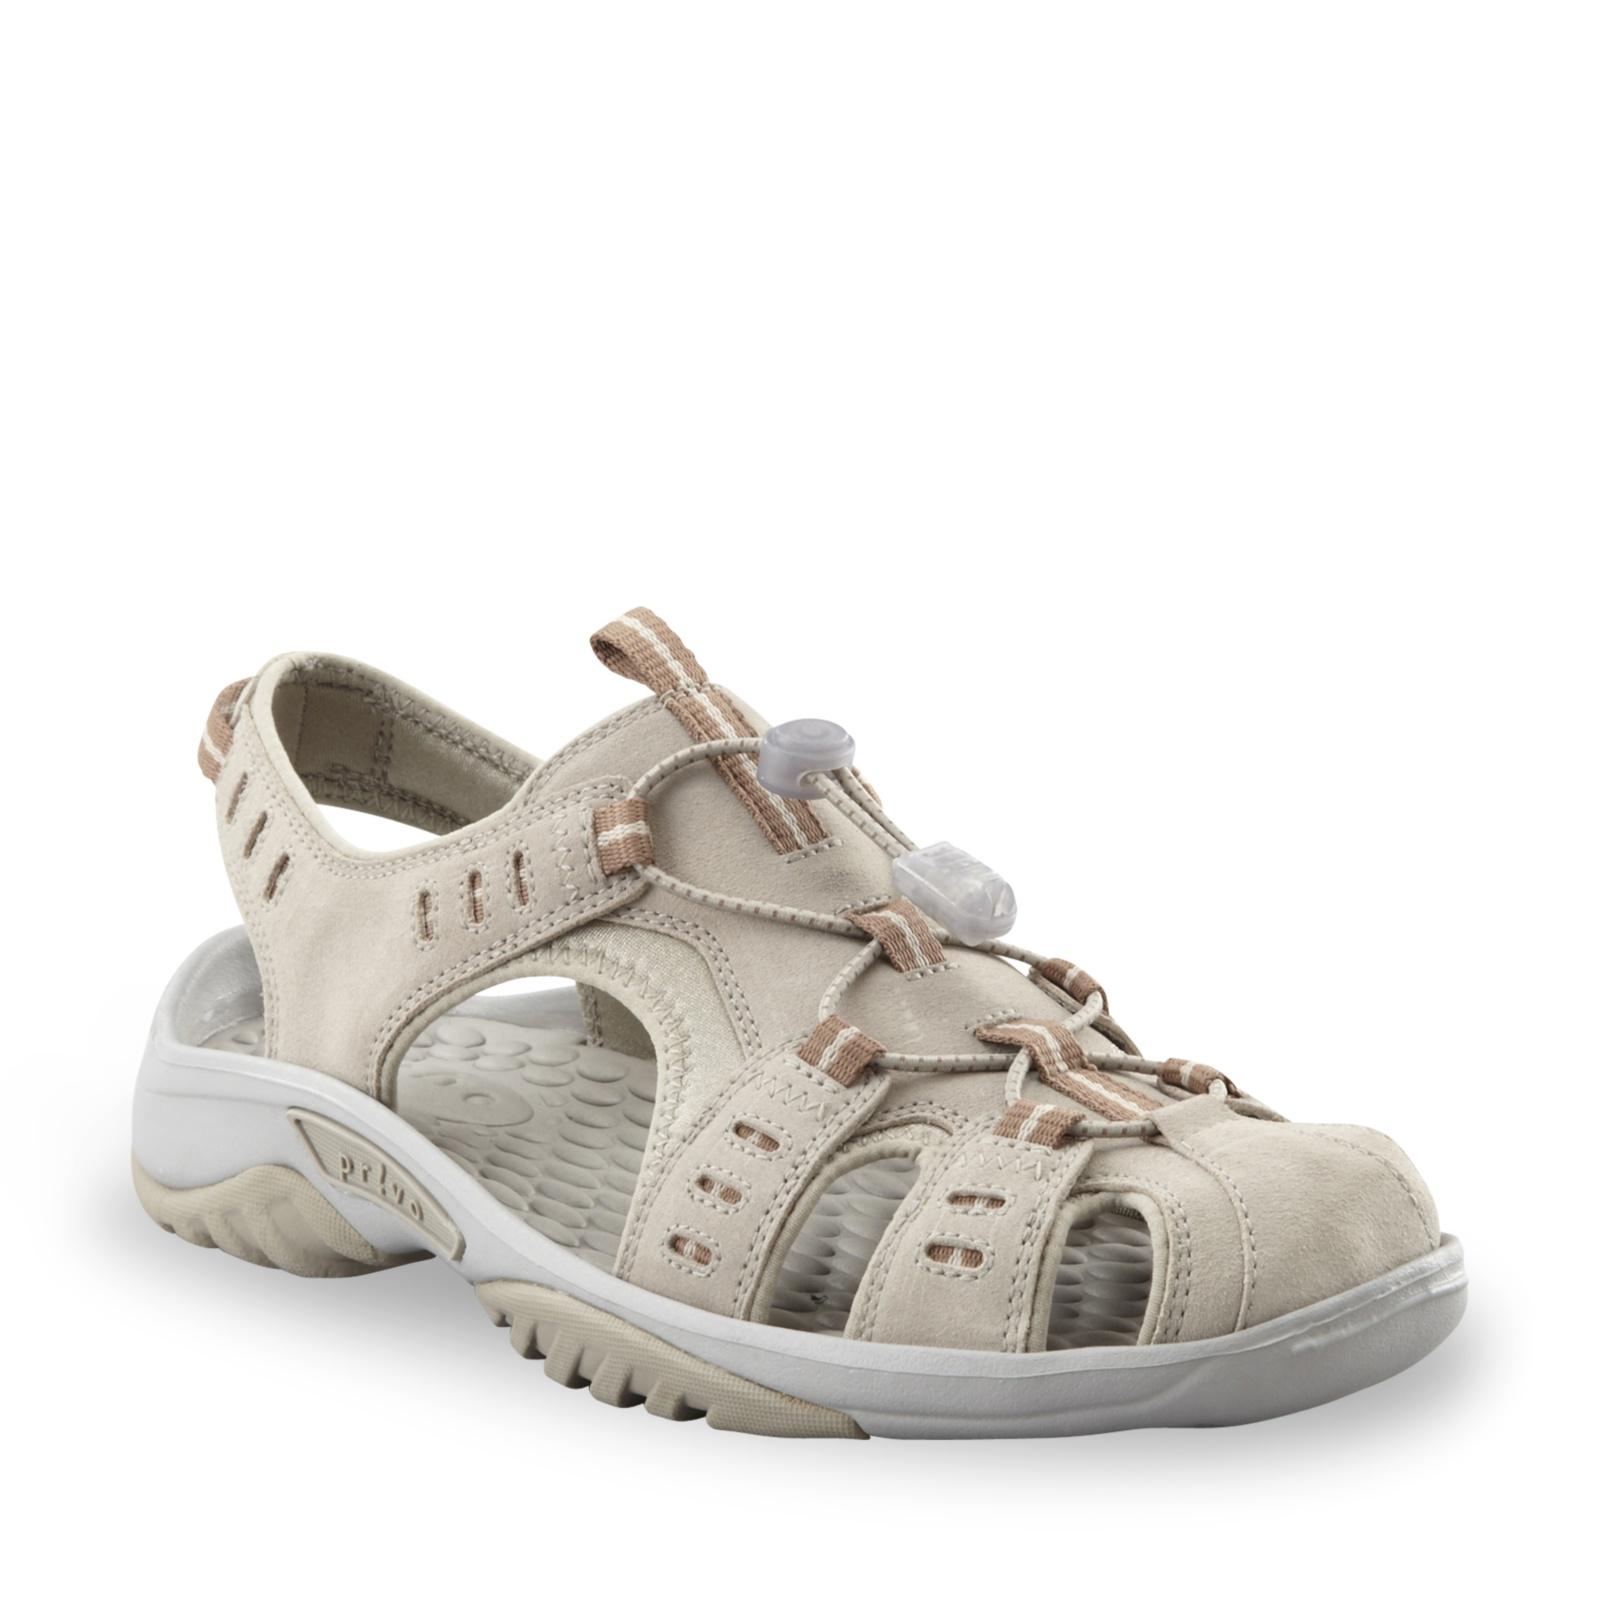 Womens Clark Shoes Amazon